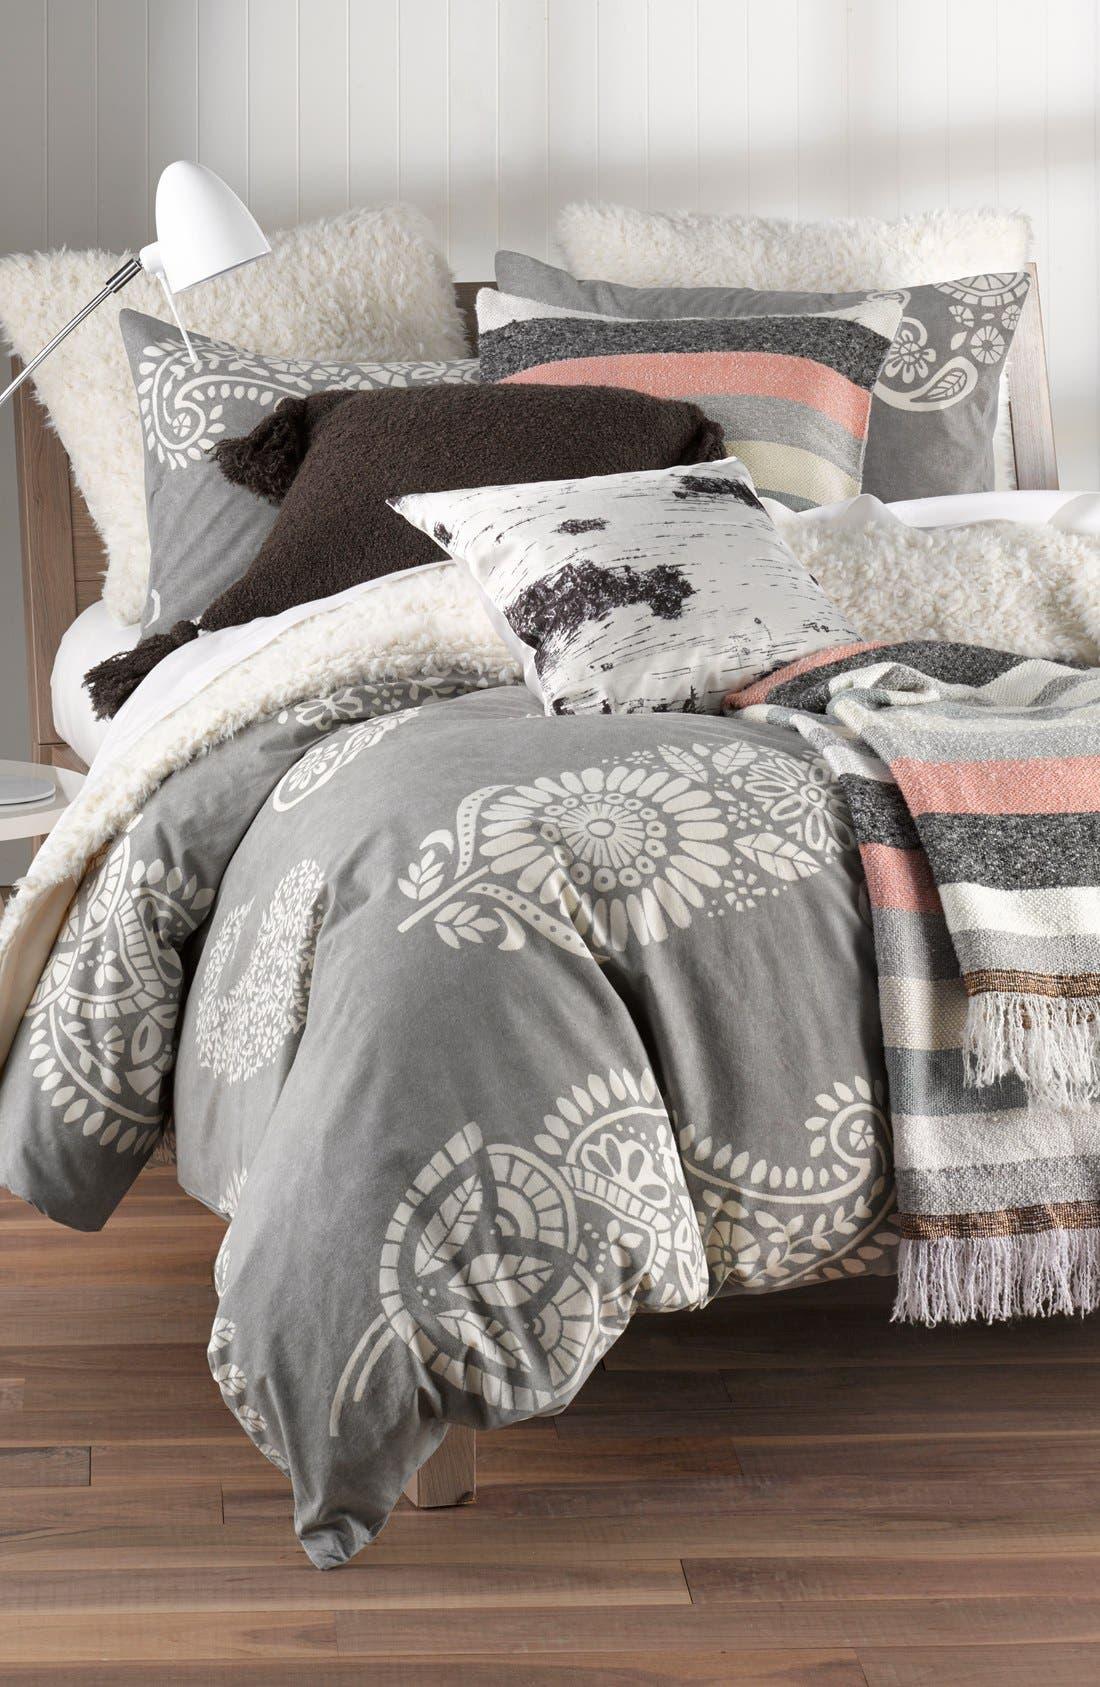 'Shaggy Plush' Faux Fur Blanket,                             Alternate thumbnail 5, color,                             900